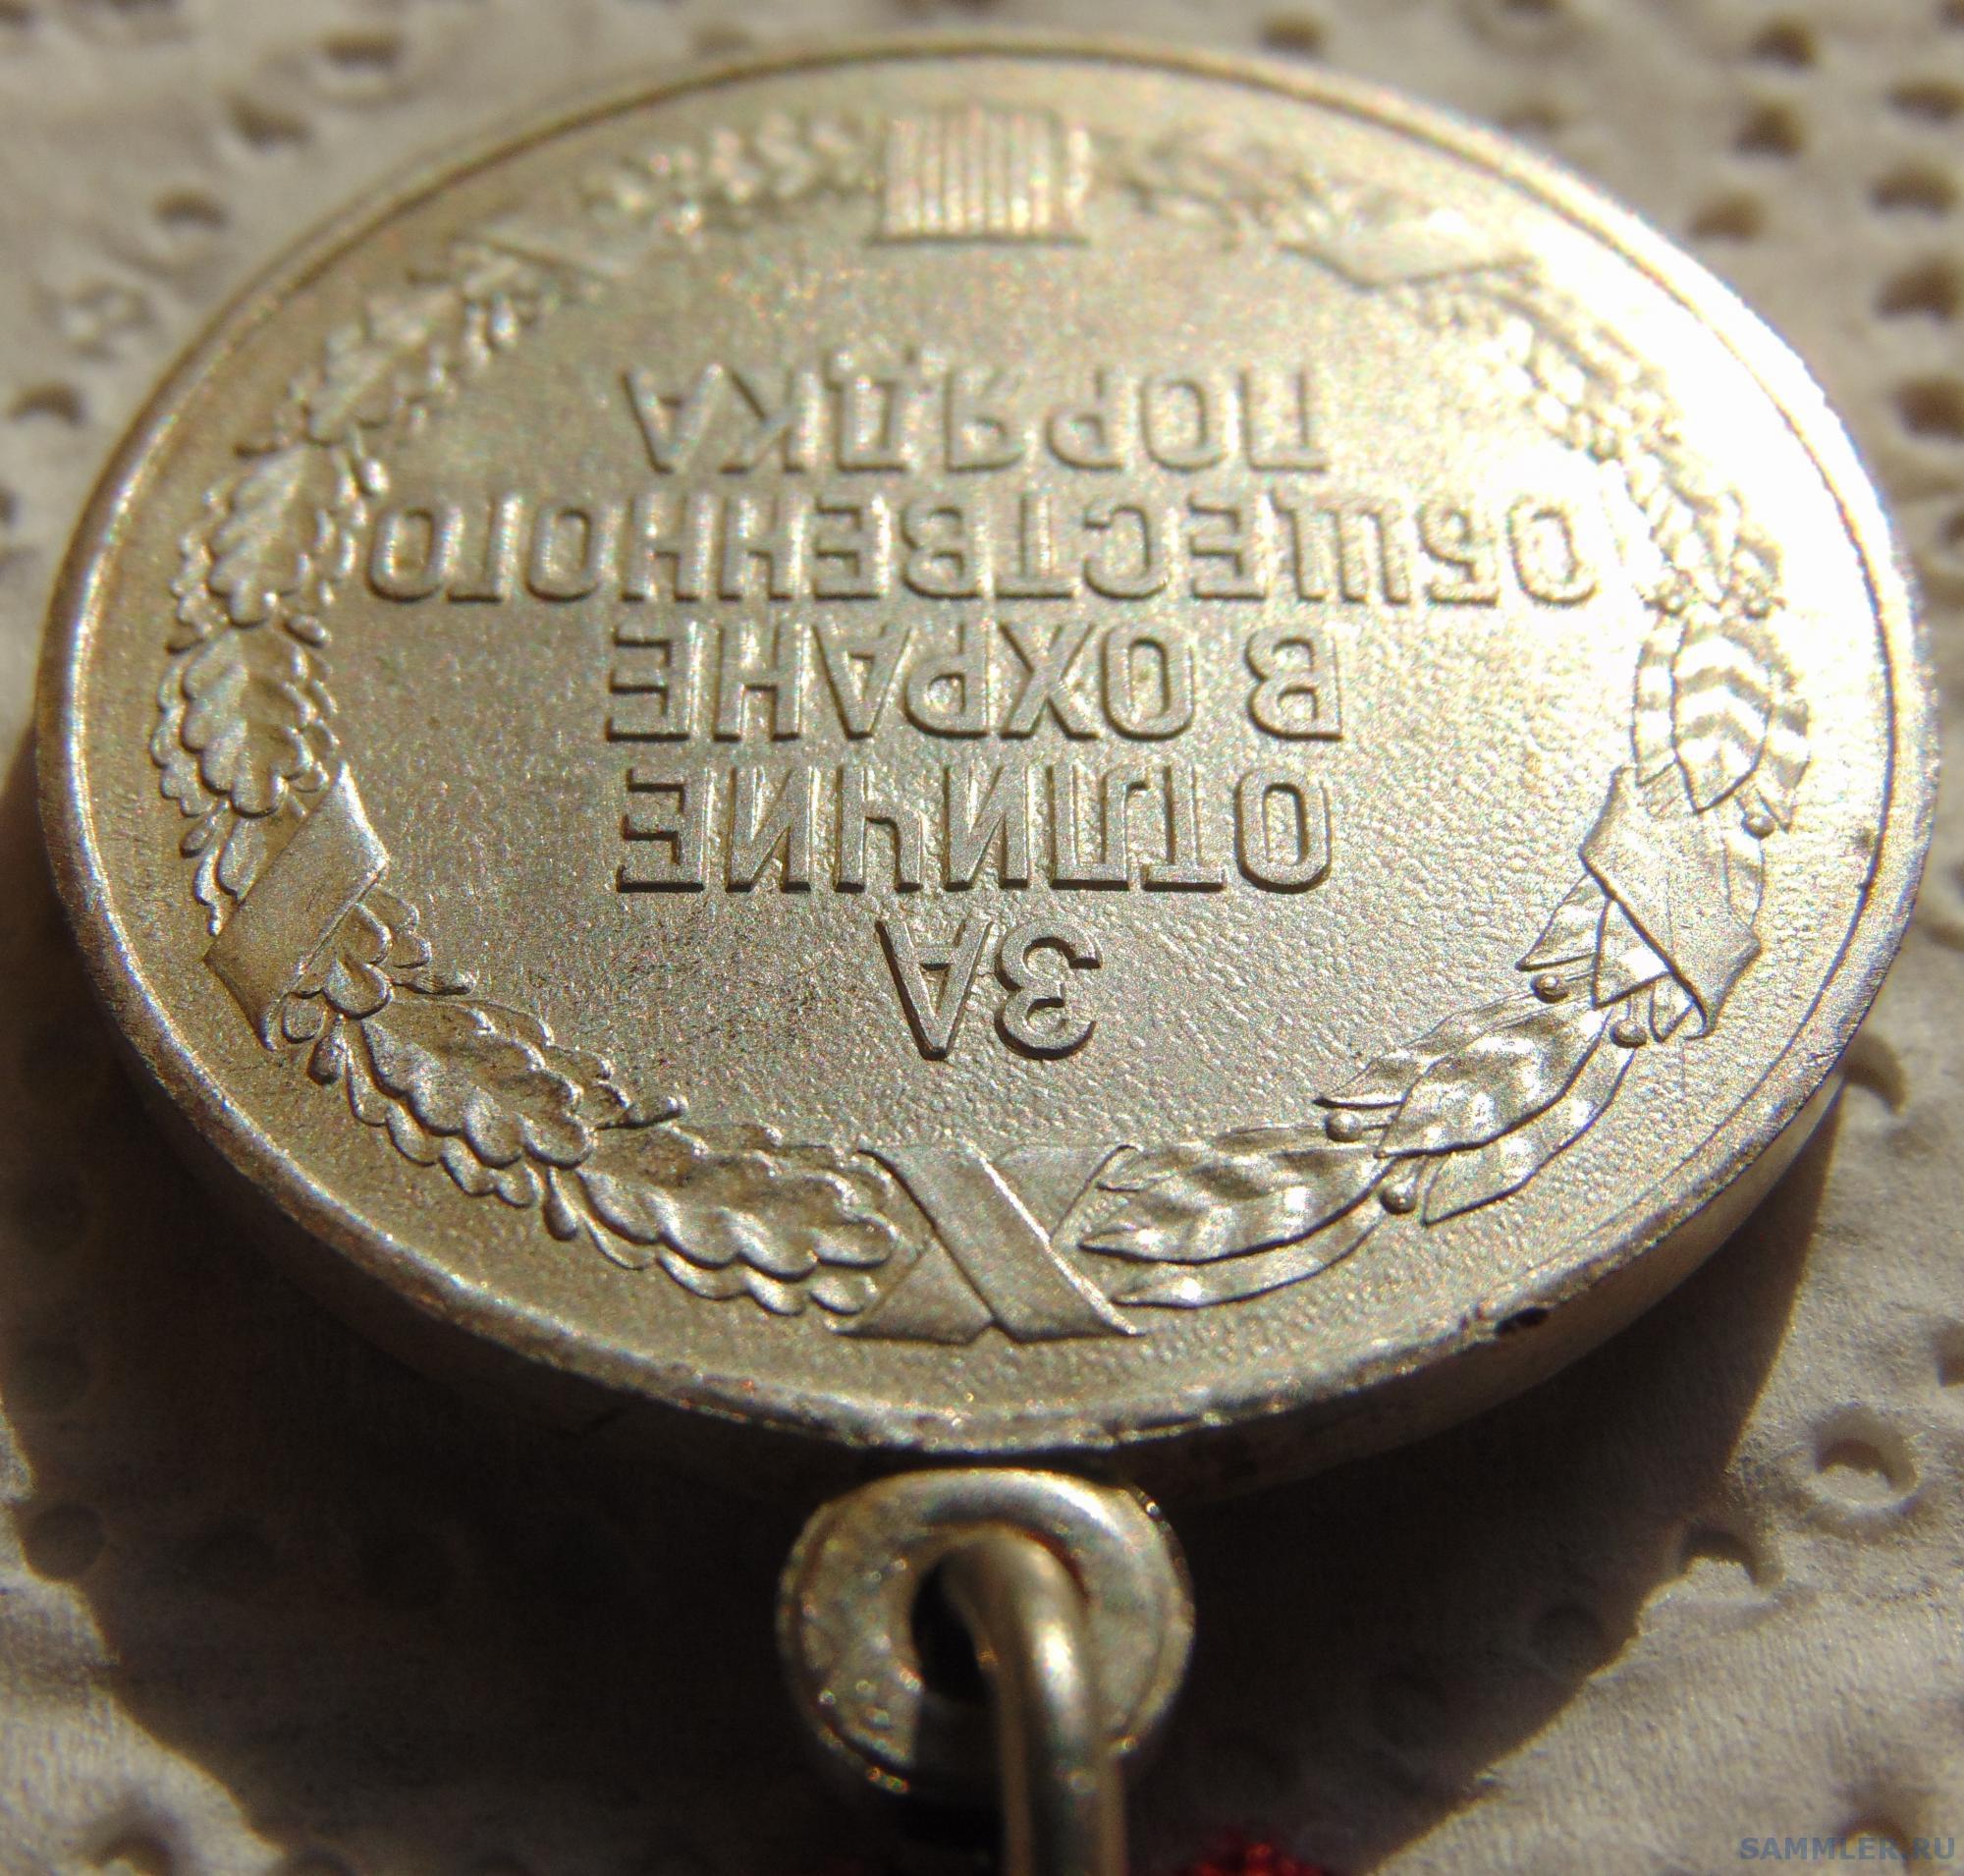 DSC04949.JPG